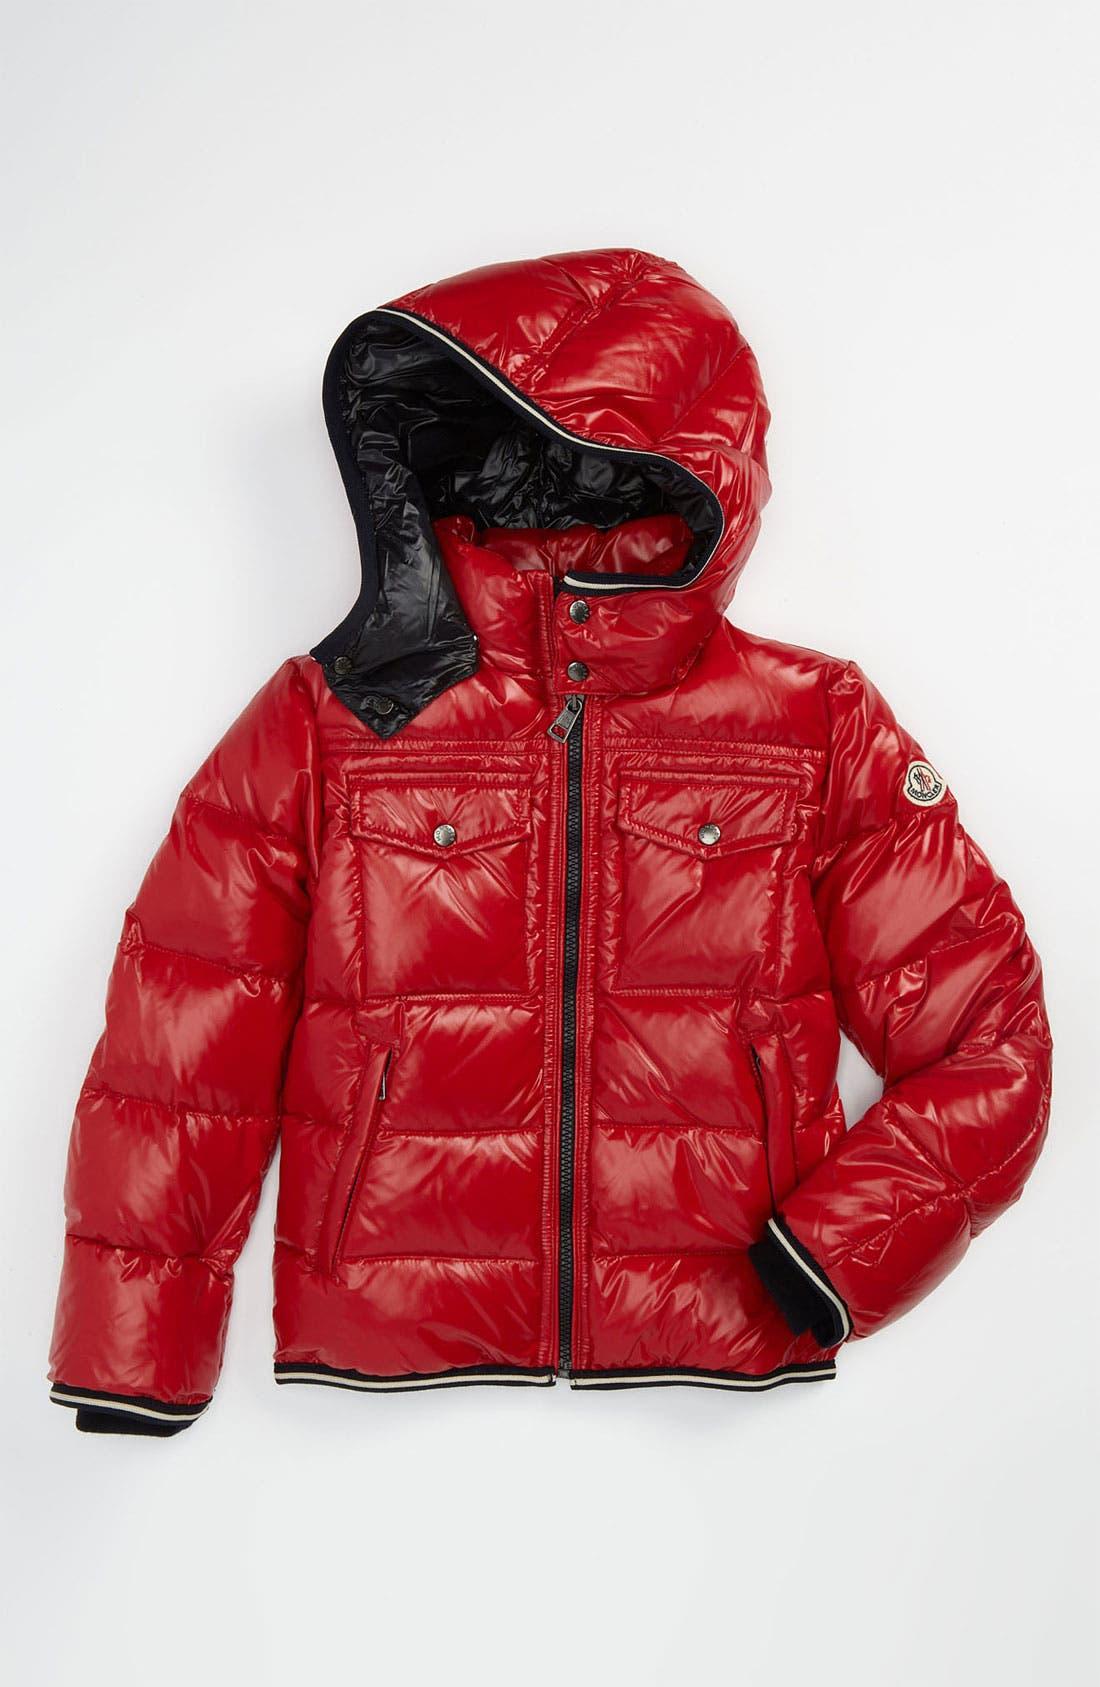 Alternate Image 1 Selected - Moncler Puffer Jacket (Big Boys)